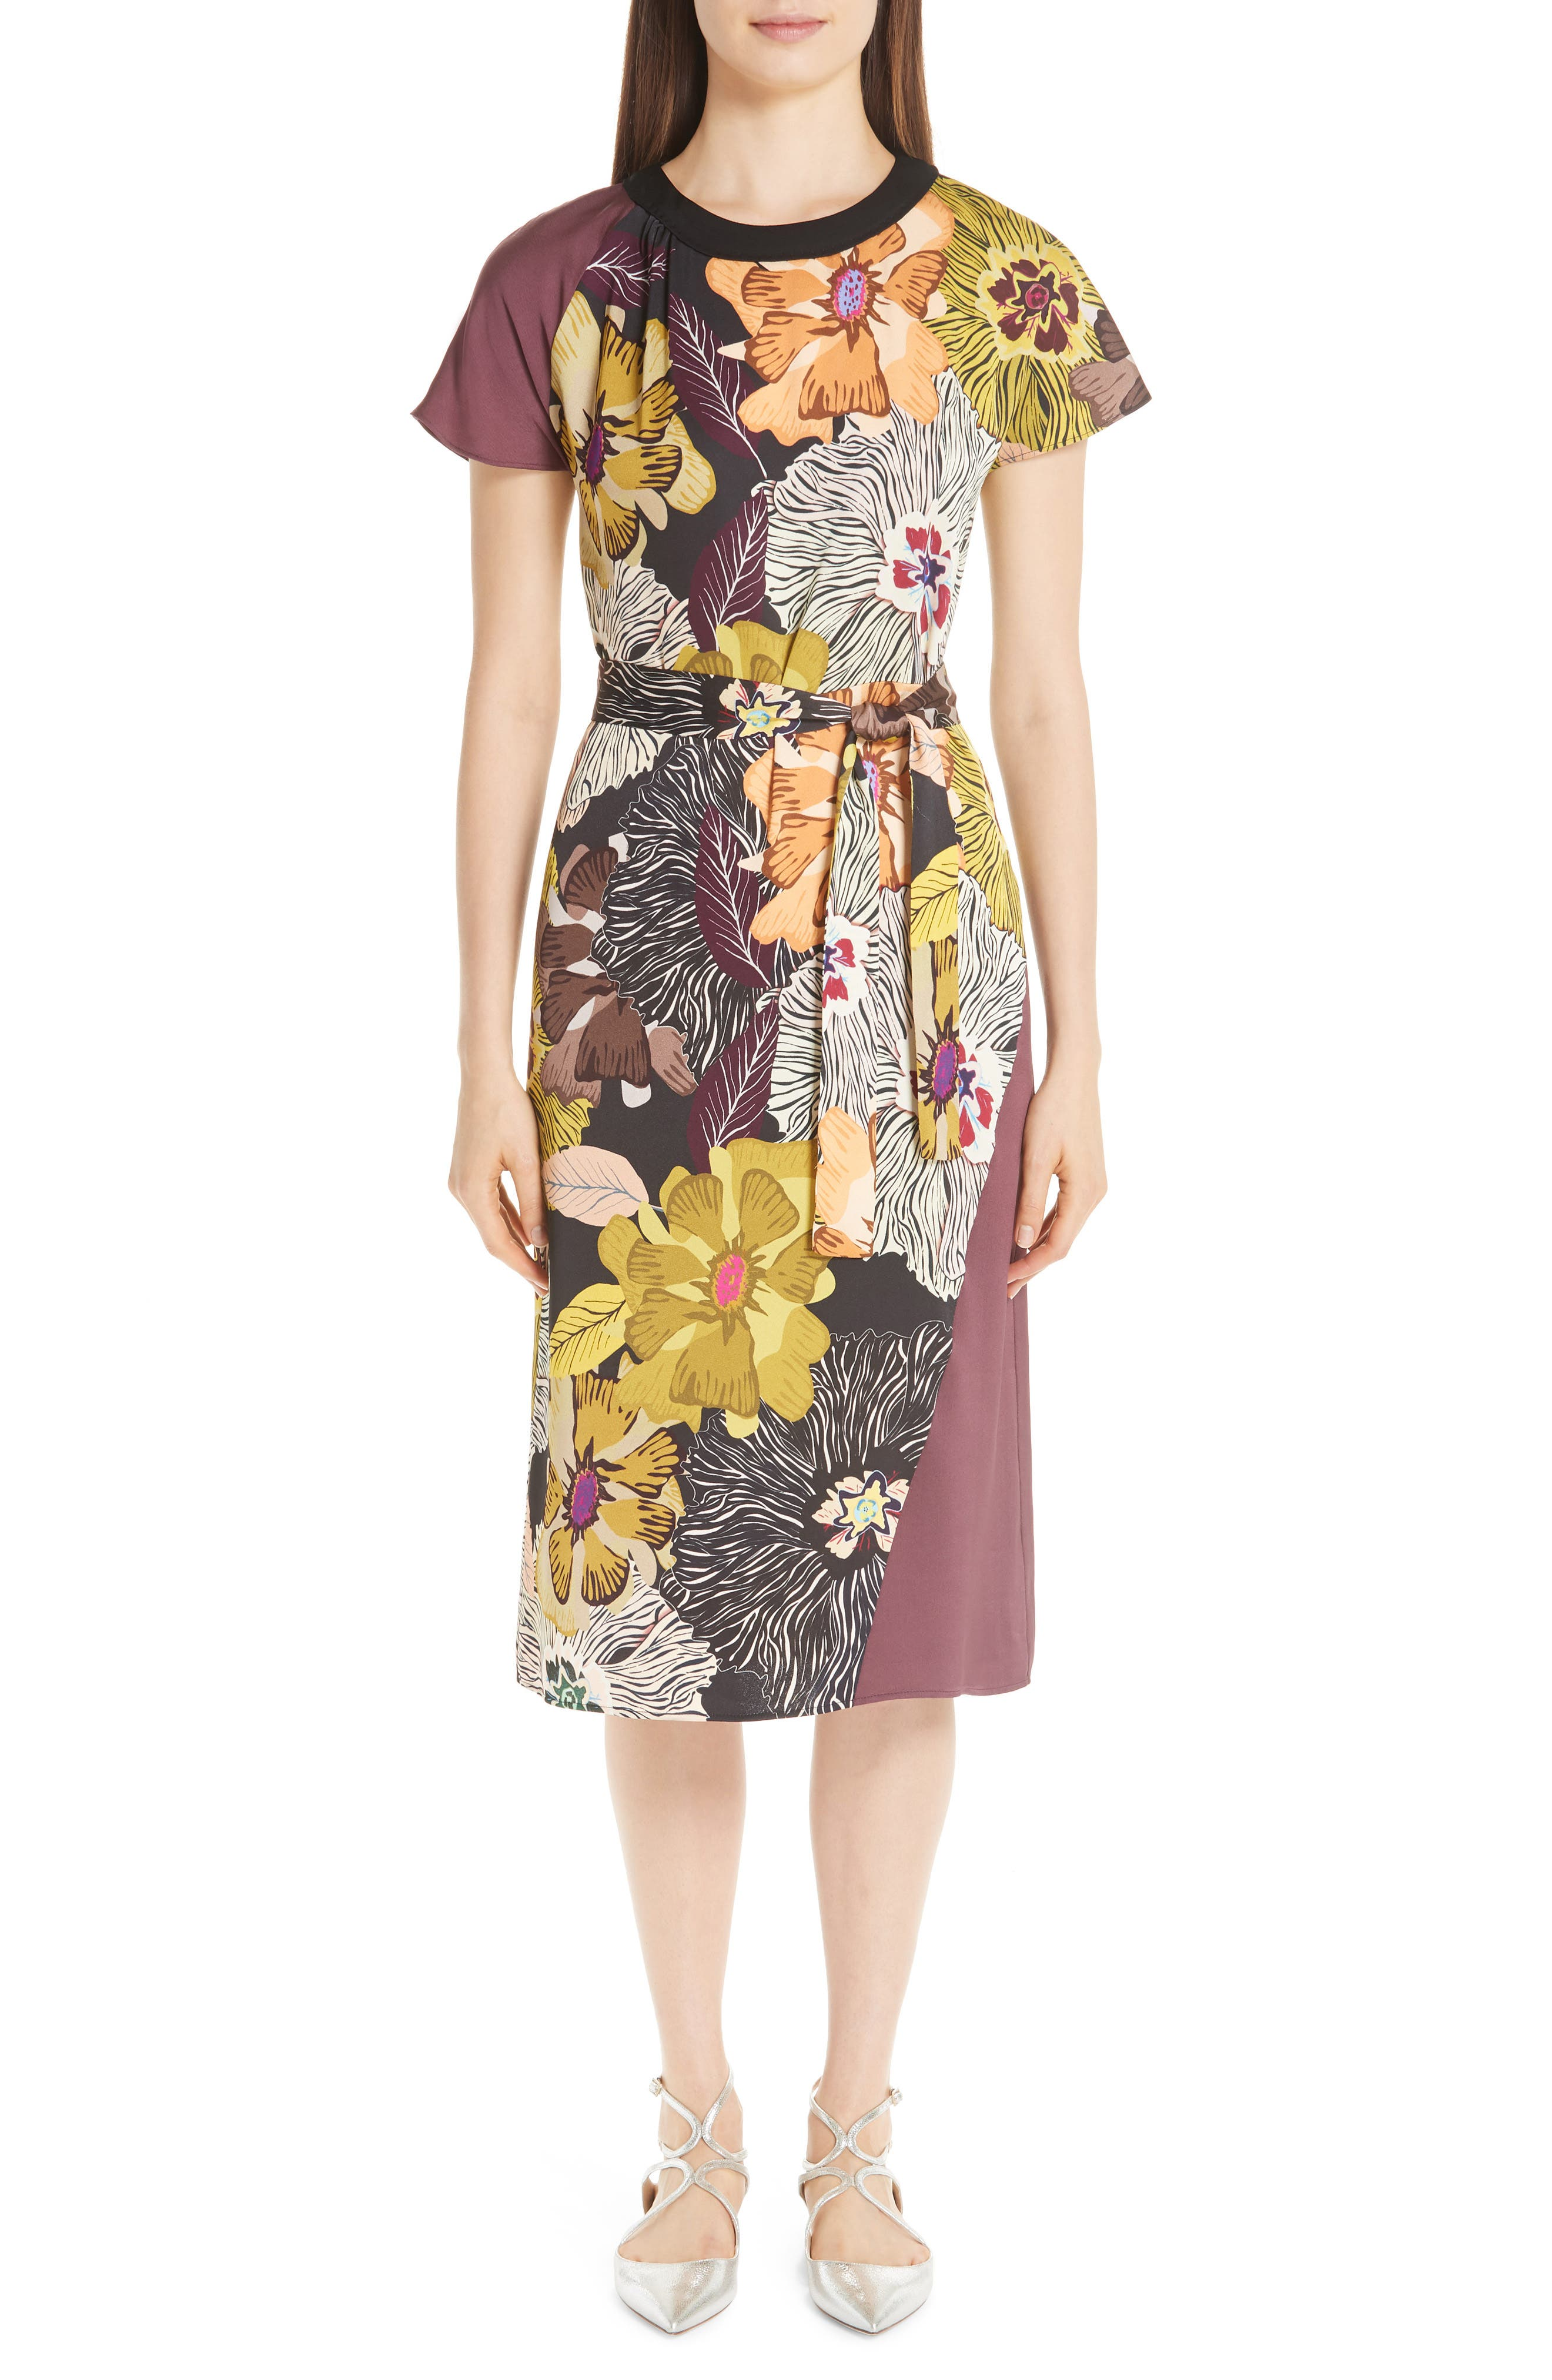 Etro Floral Print Belted Dress